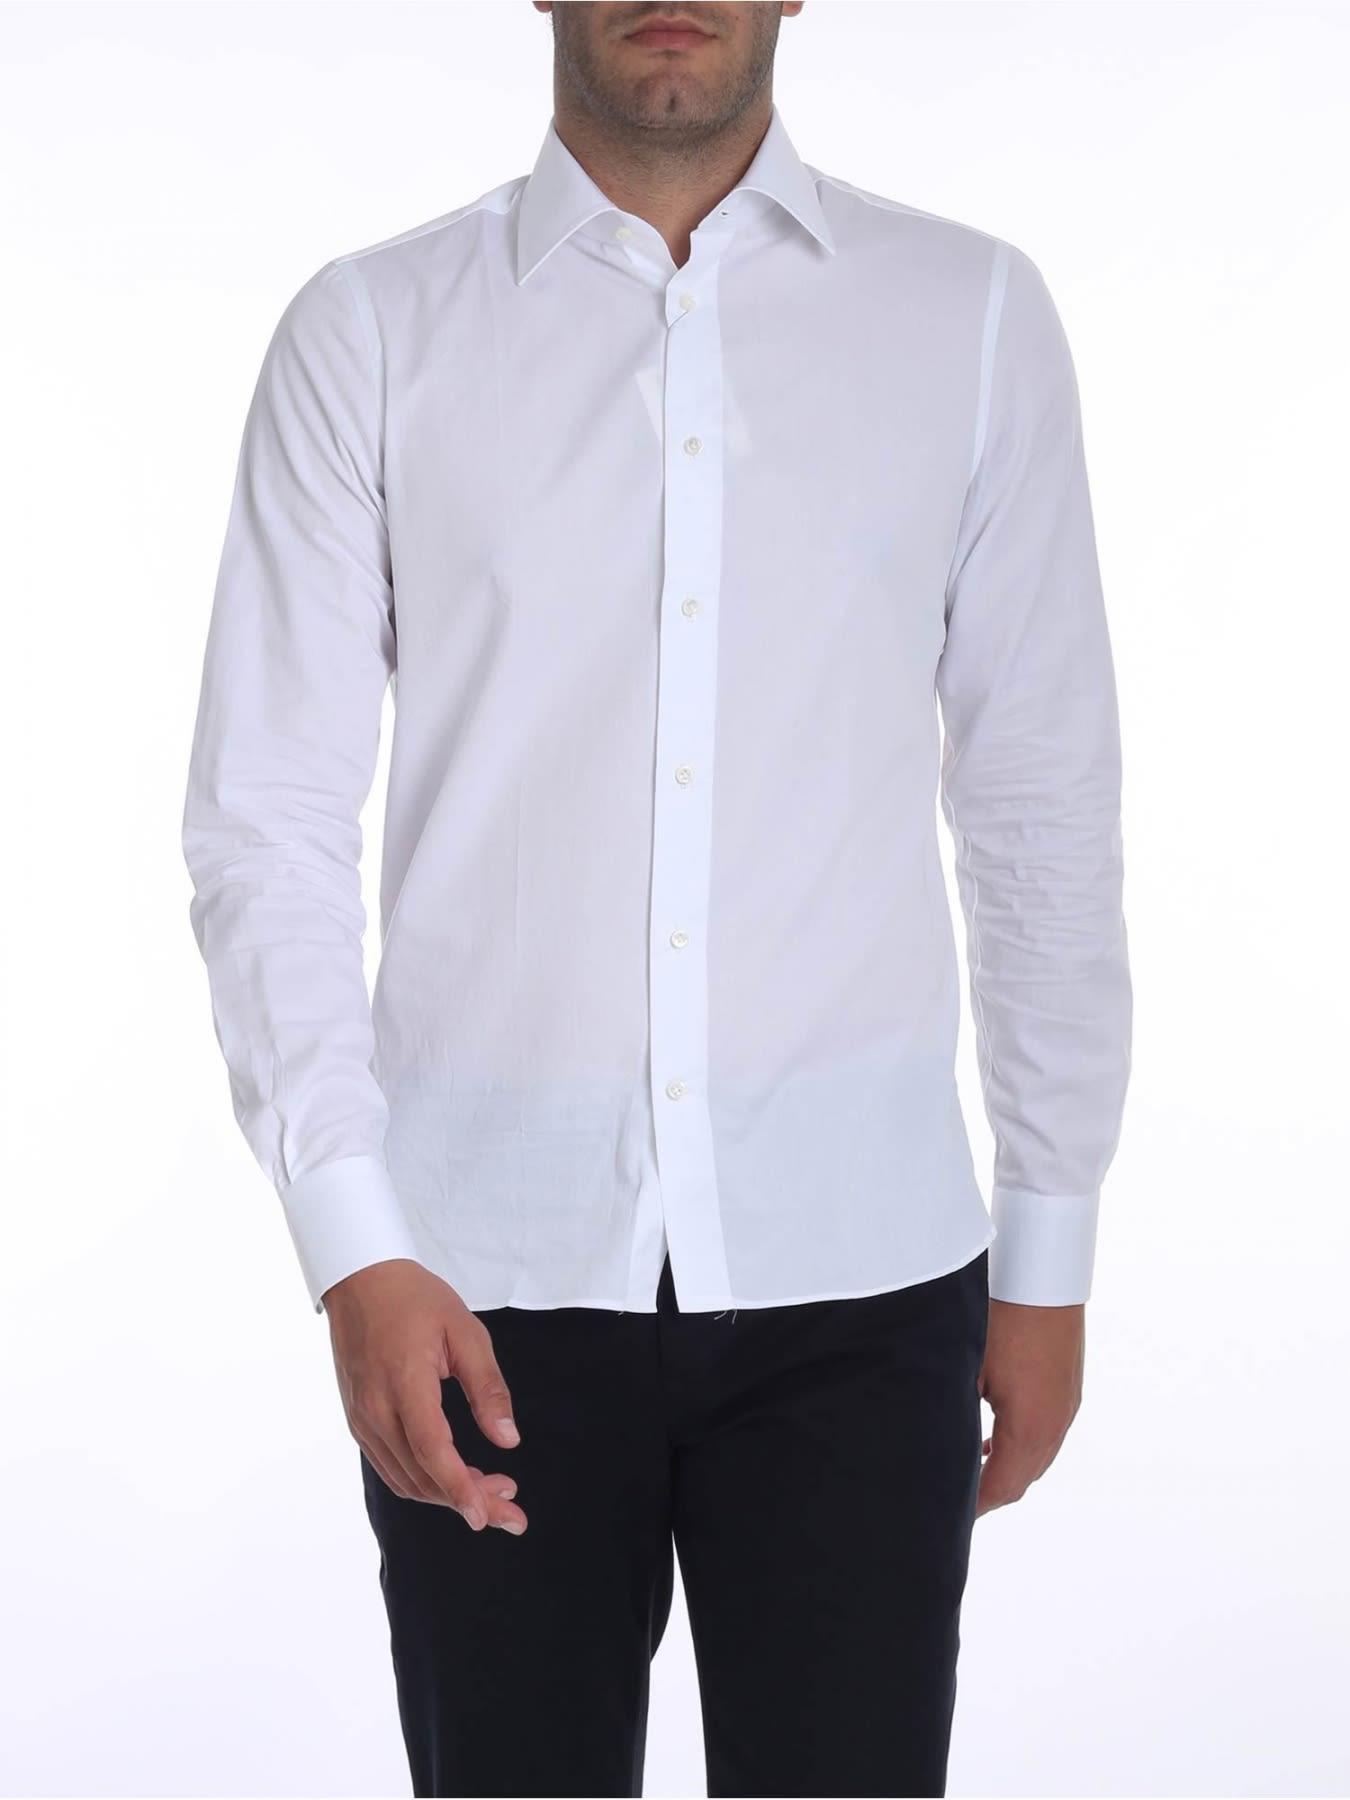 G. INGLESE Cotton Shirt in White